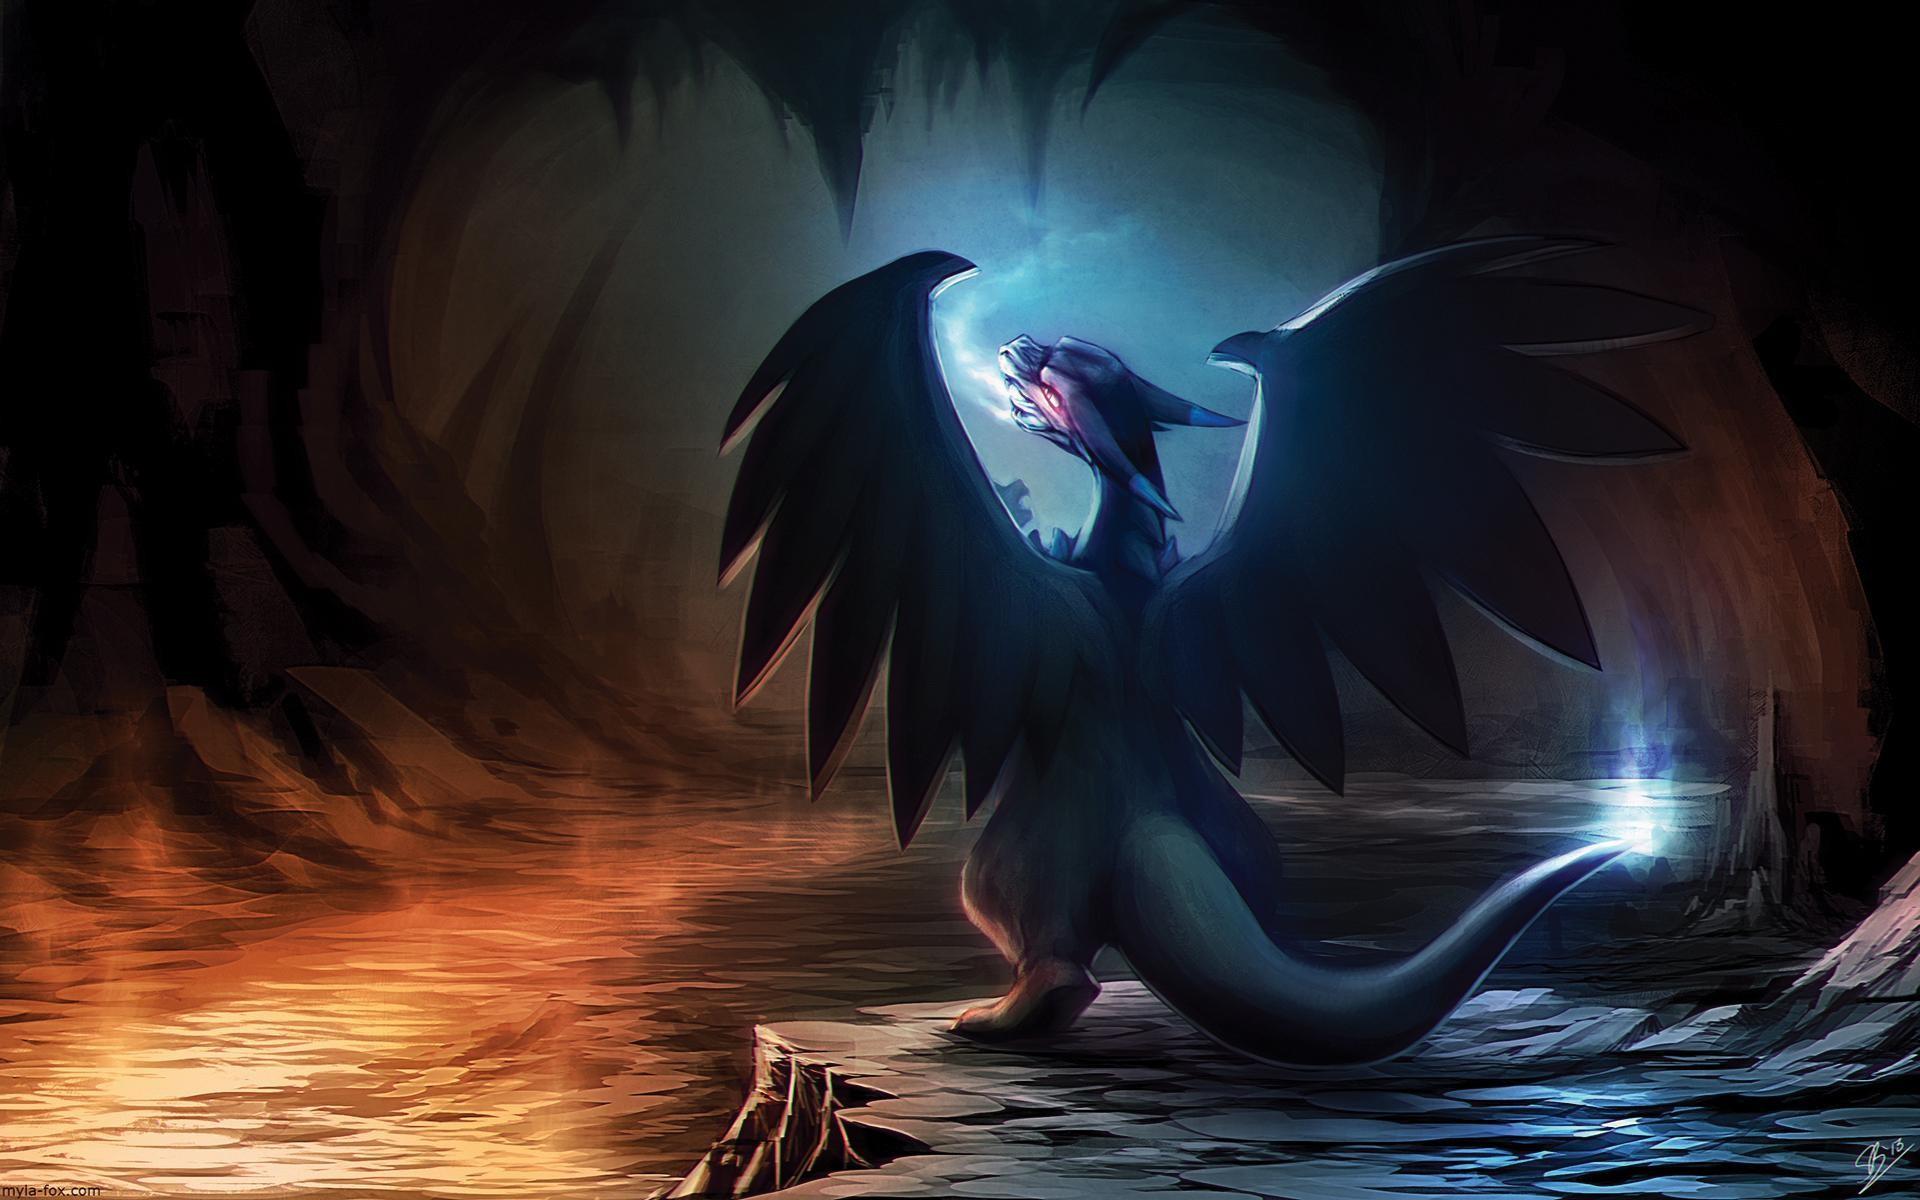 Pokemon-Charizard-HD-Wallpaper-1